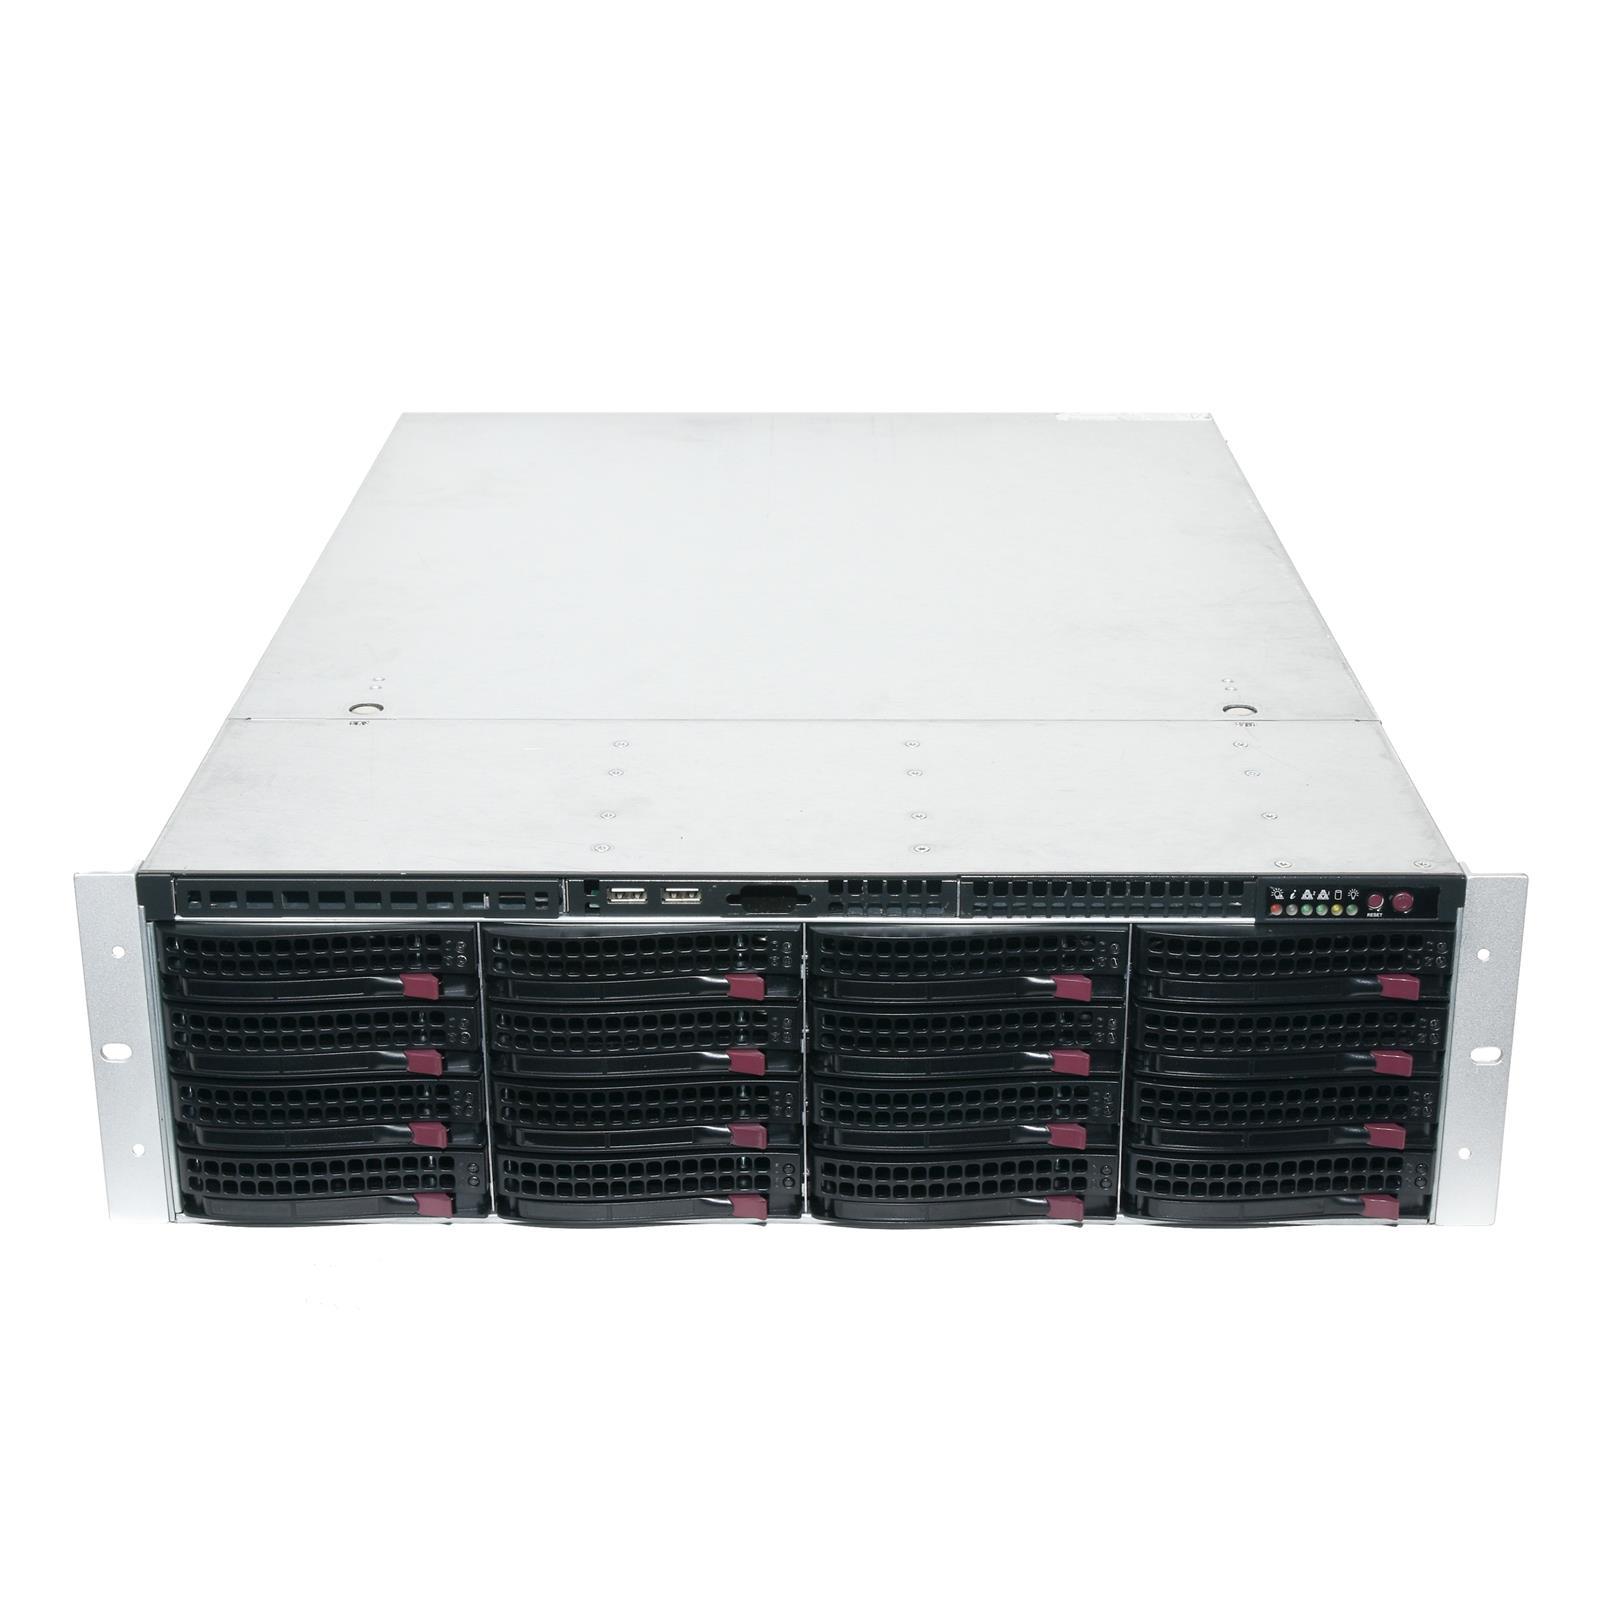 Supermicro 3U Barebone 3U Server Chassis 16x Trays BPN-SAS2-836EL1 W// Rails